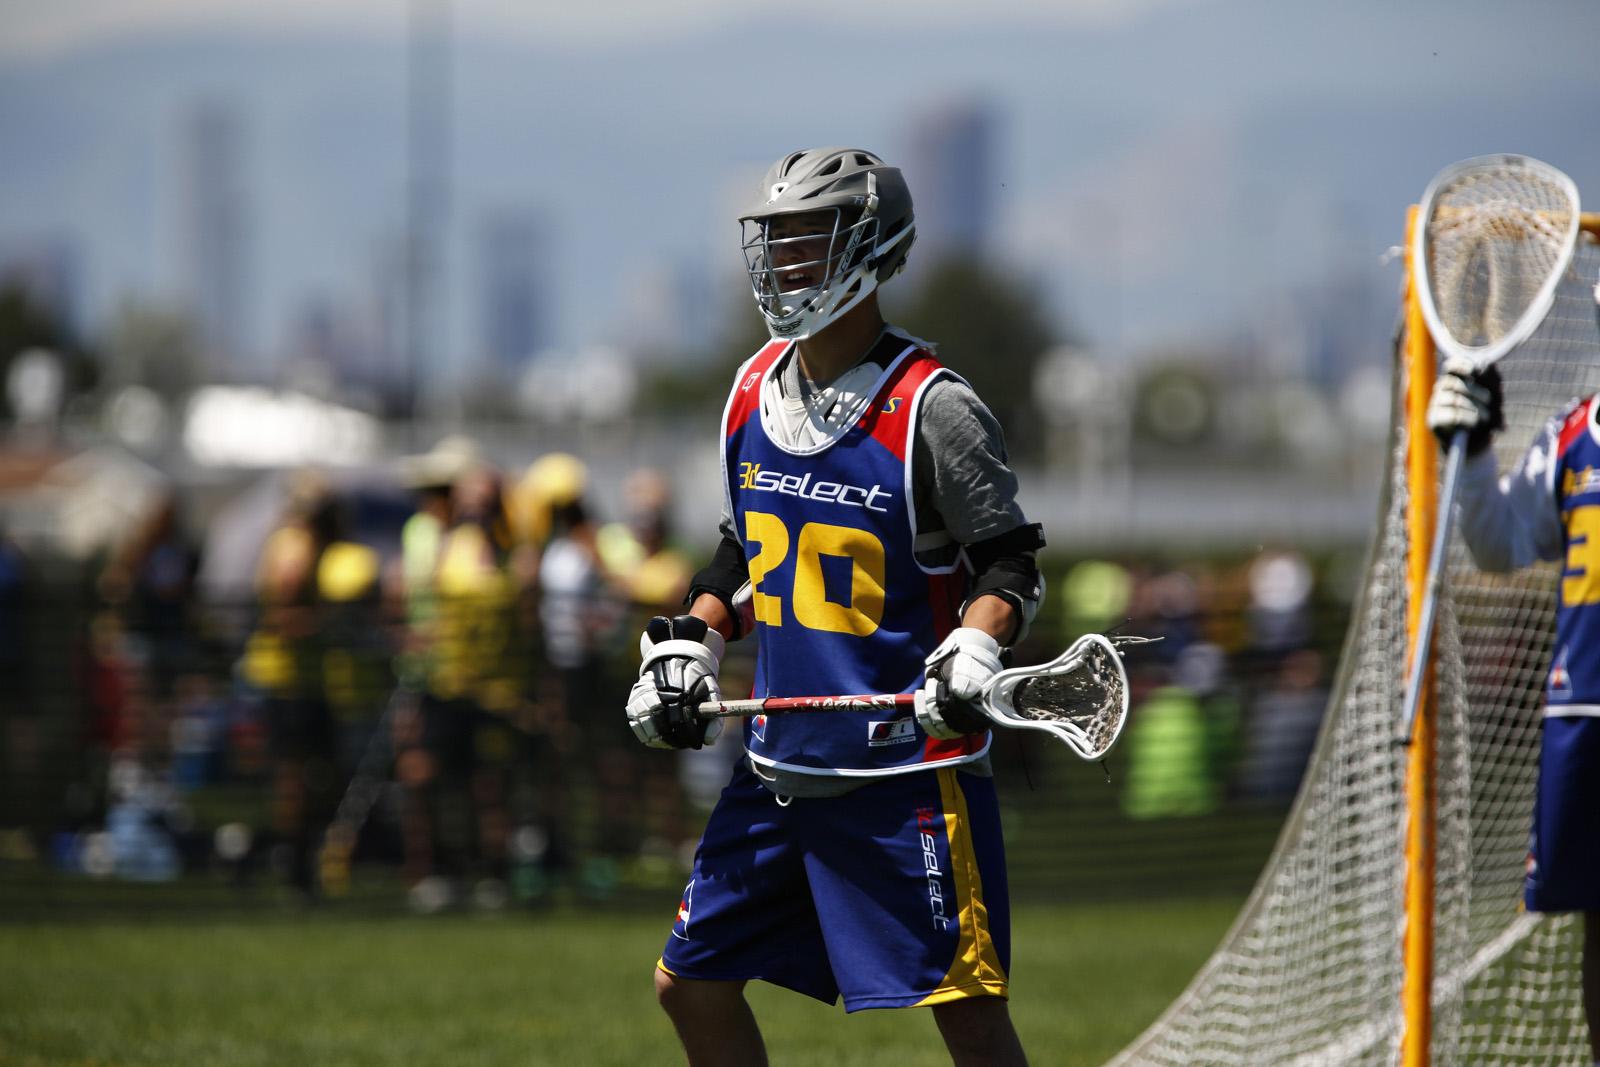 #20 - 3d Player Keaton Komatz - Heritage to Notre Dame